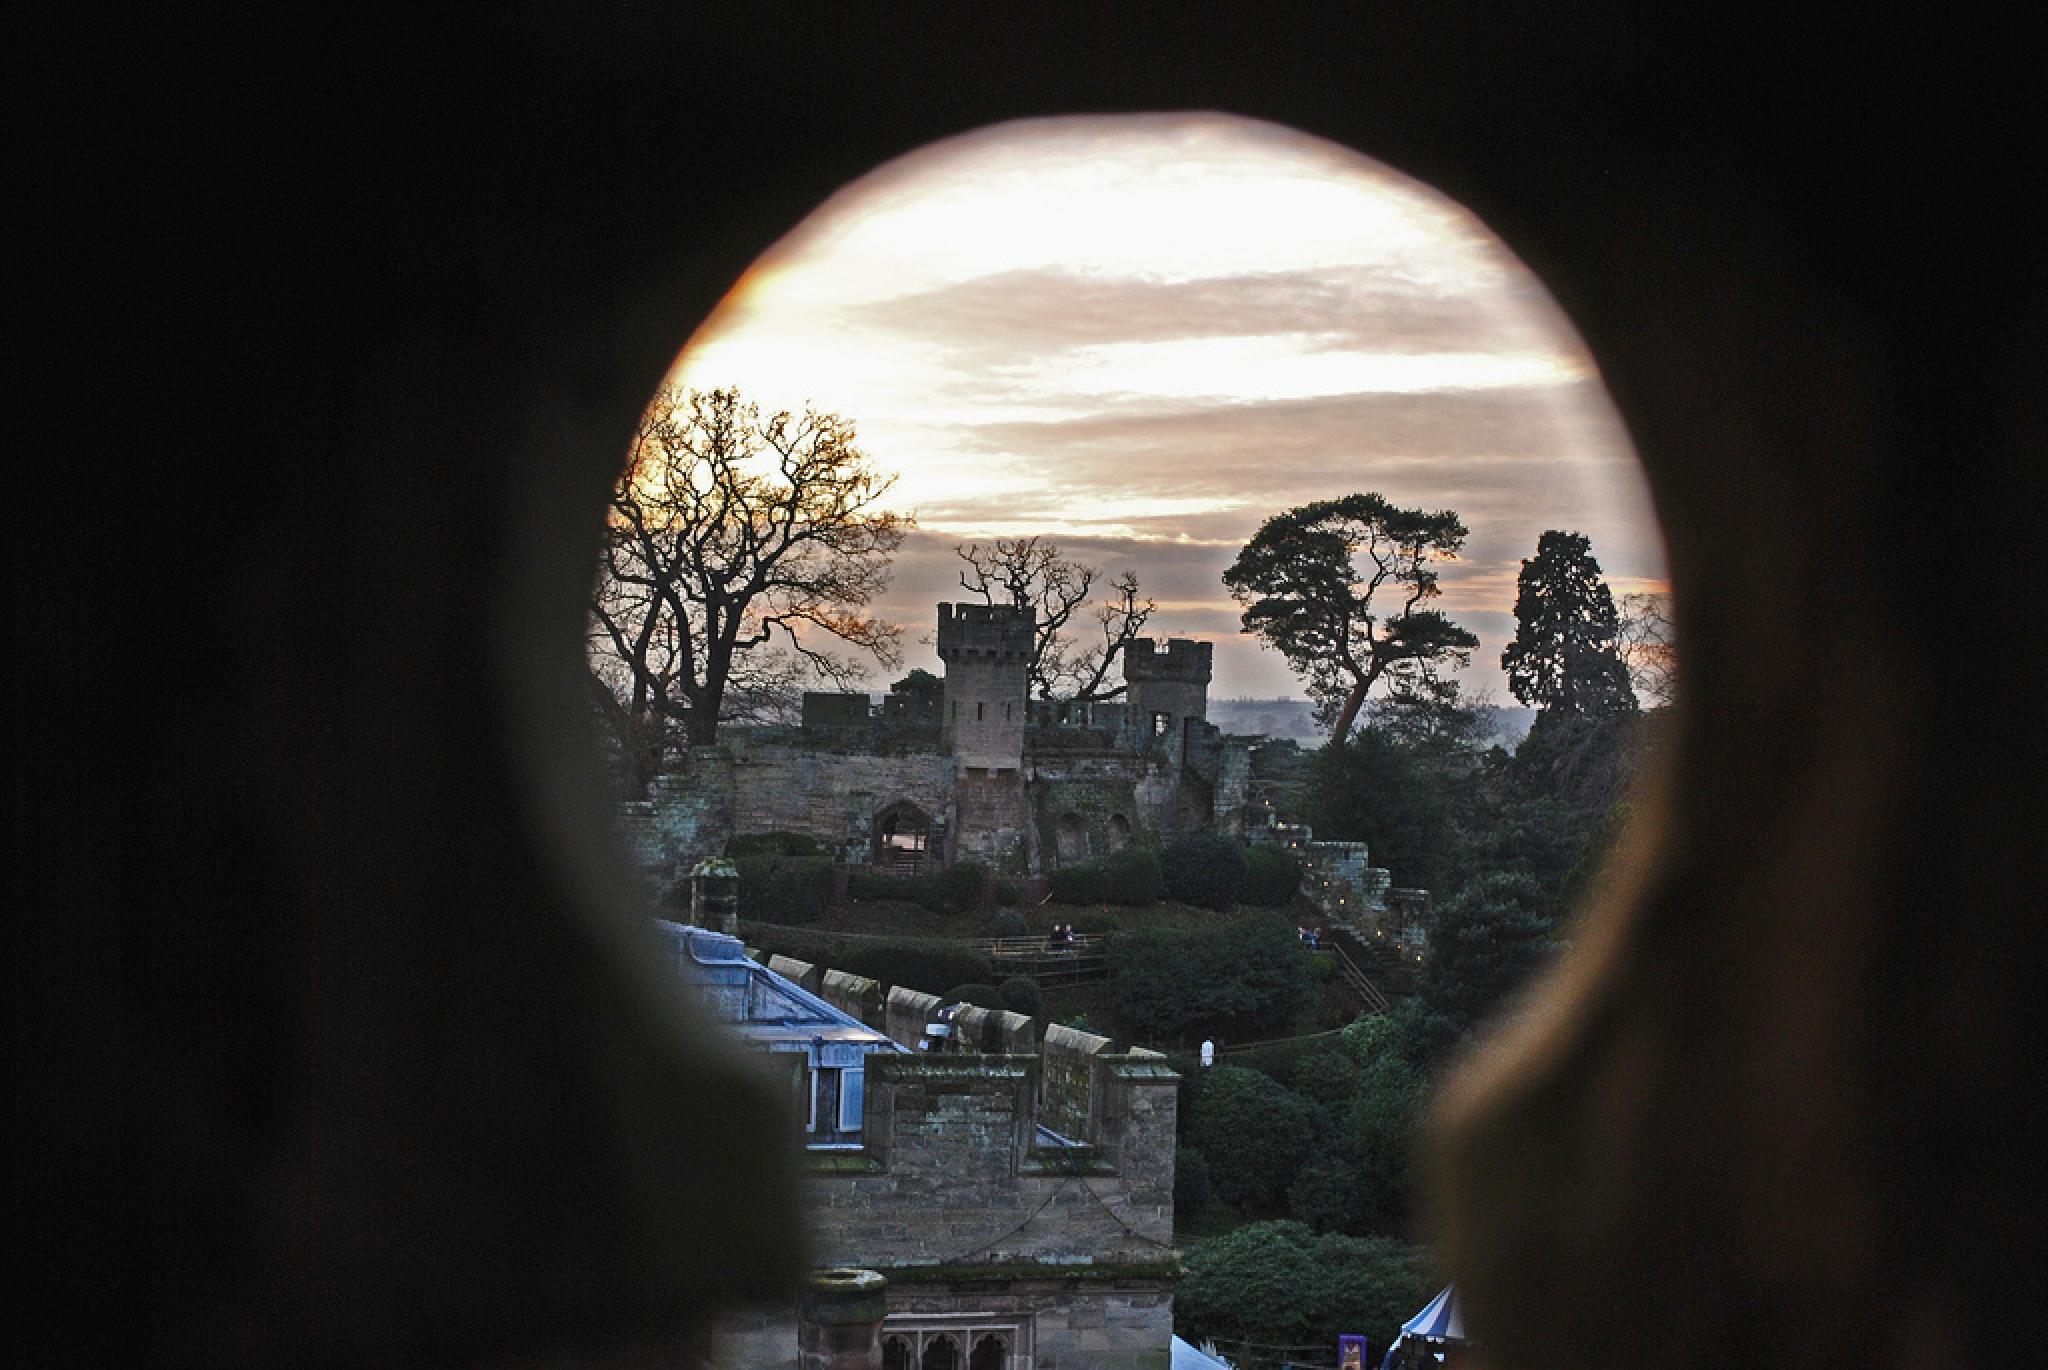 Through The Keyhole by Aligeeach